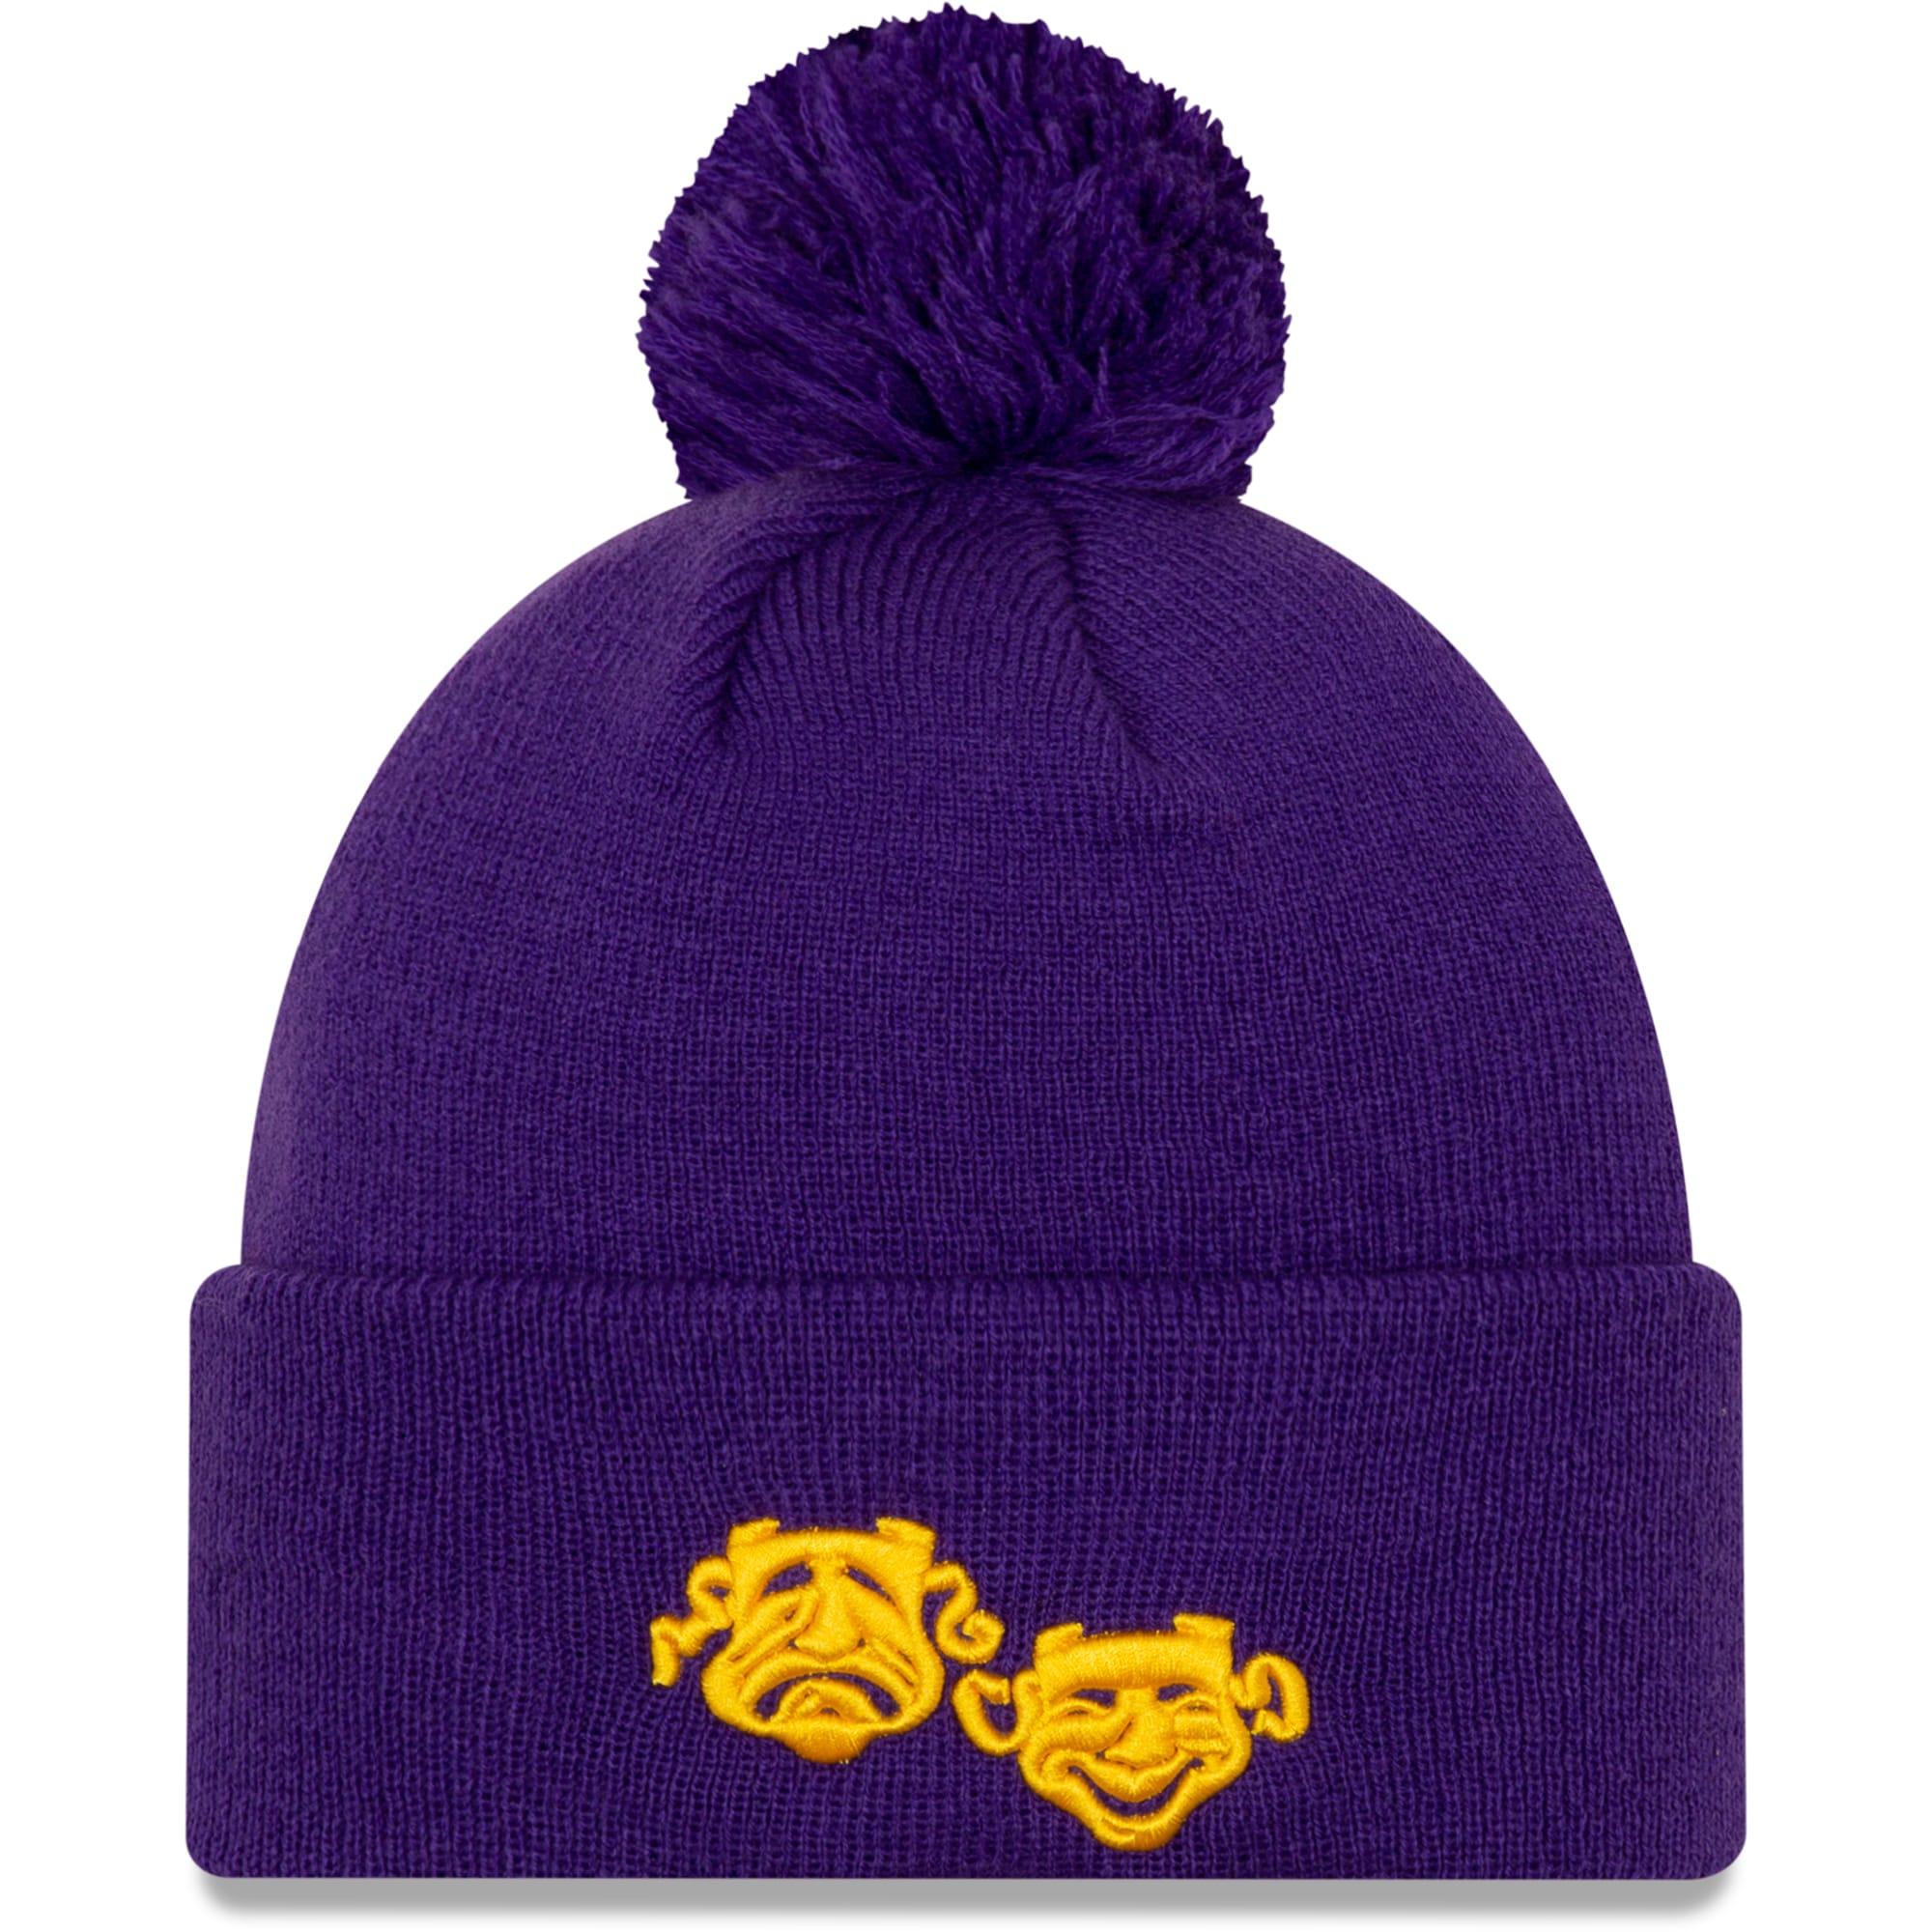 New Orleans Pelicans New Era 2019/20 City Edition Pom Knit Hat - Purple